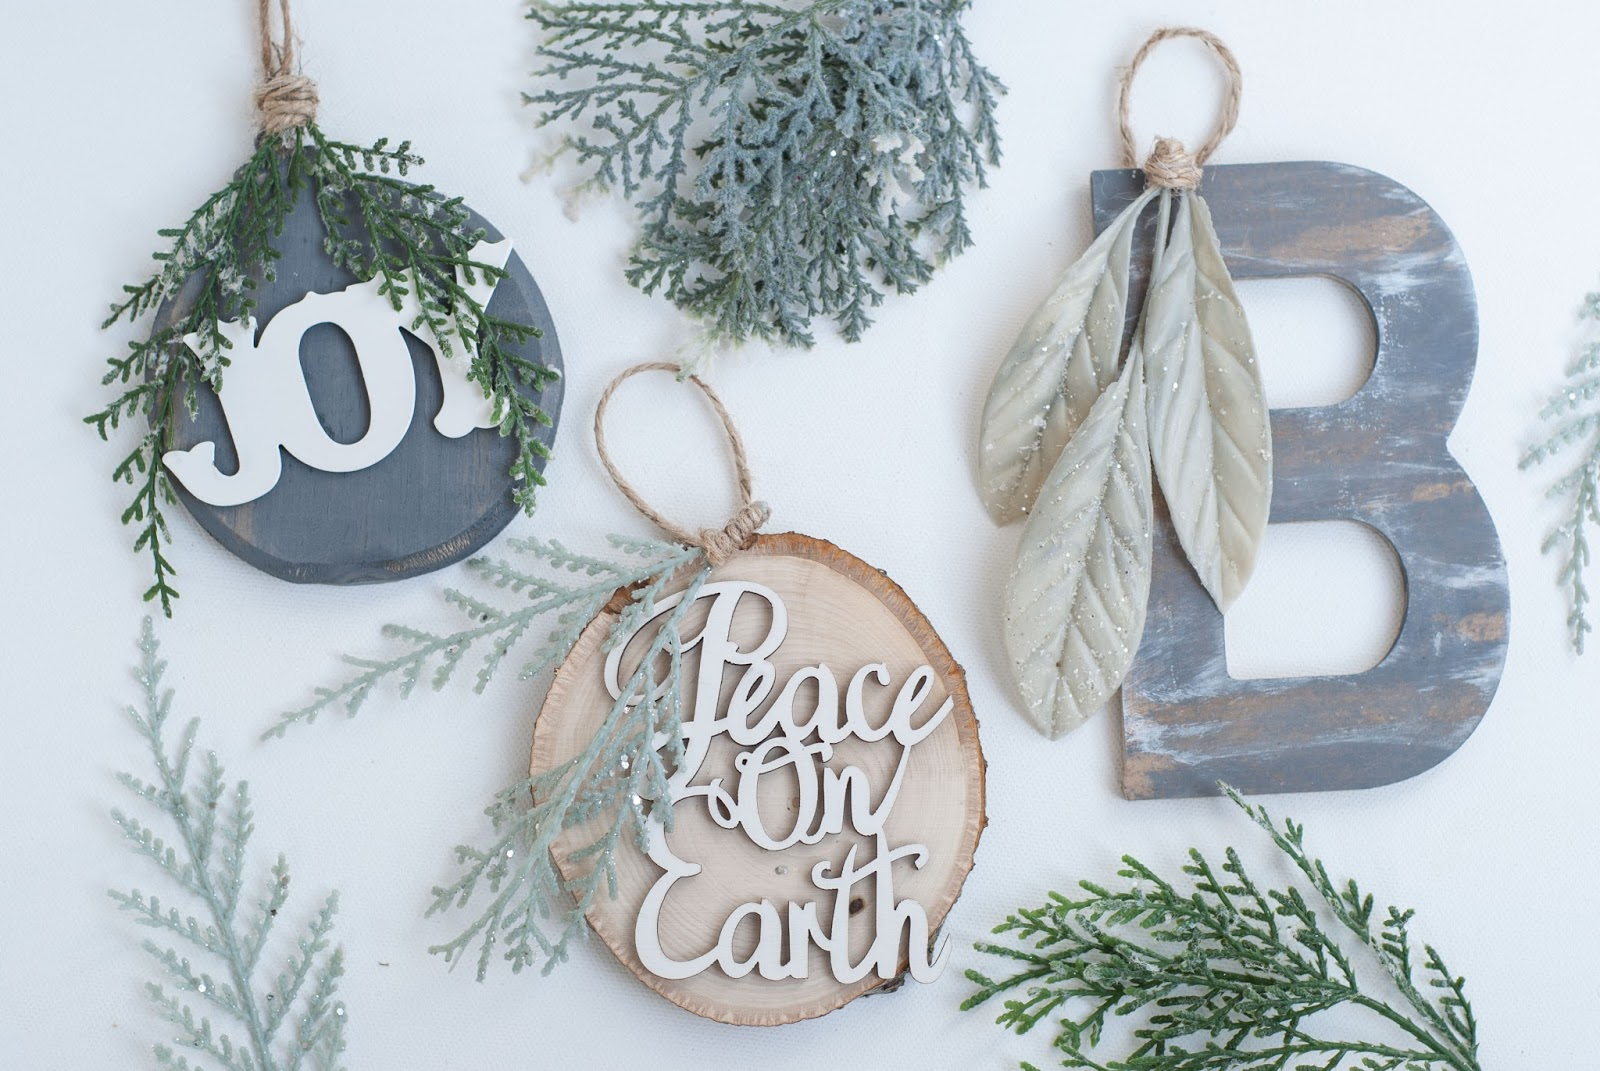 12 DIY Rustic Ornaments for Christmas  Rustic Ornaments, DIY Ornaments, Holiday Ornaments, DIY Christmas, DIY Christmas Ornaments, Holiday Crafts, Holiday Craft Projects, Crafts, Christmas Crafts #ChristmasOrnaments #Christmas #HolidayCrafts